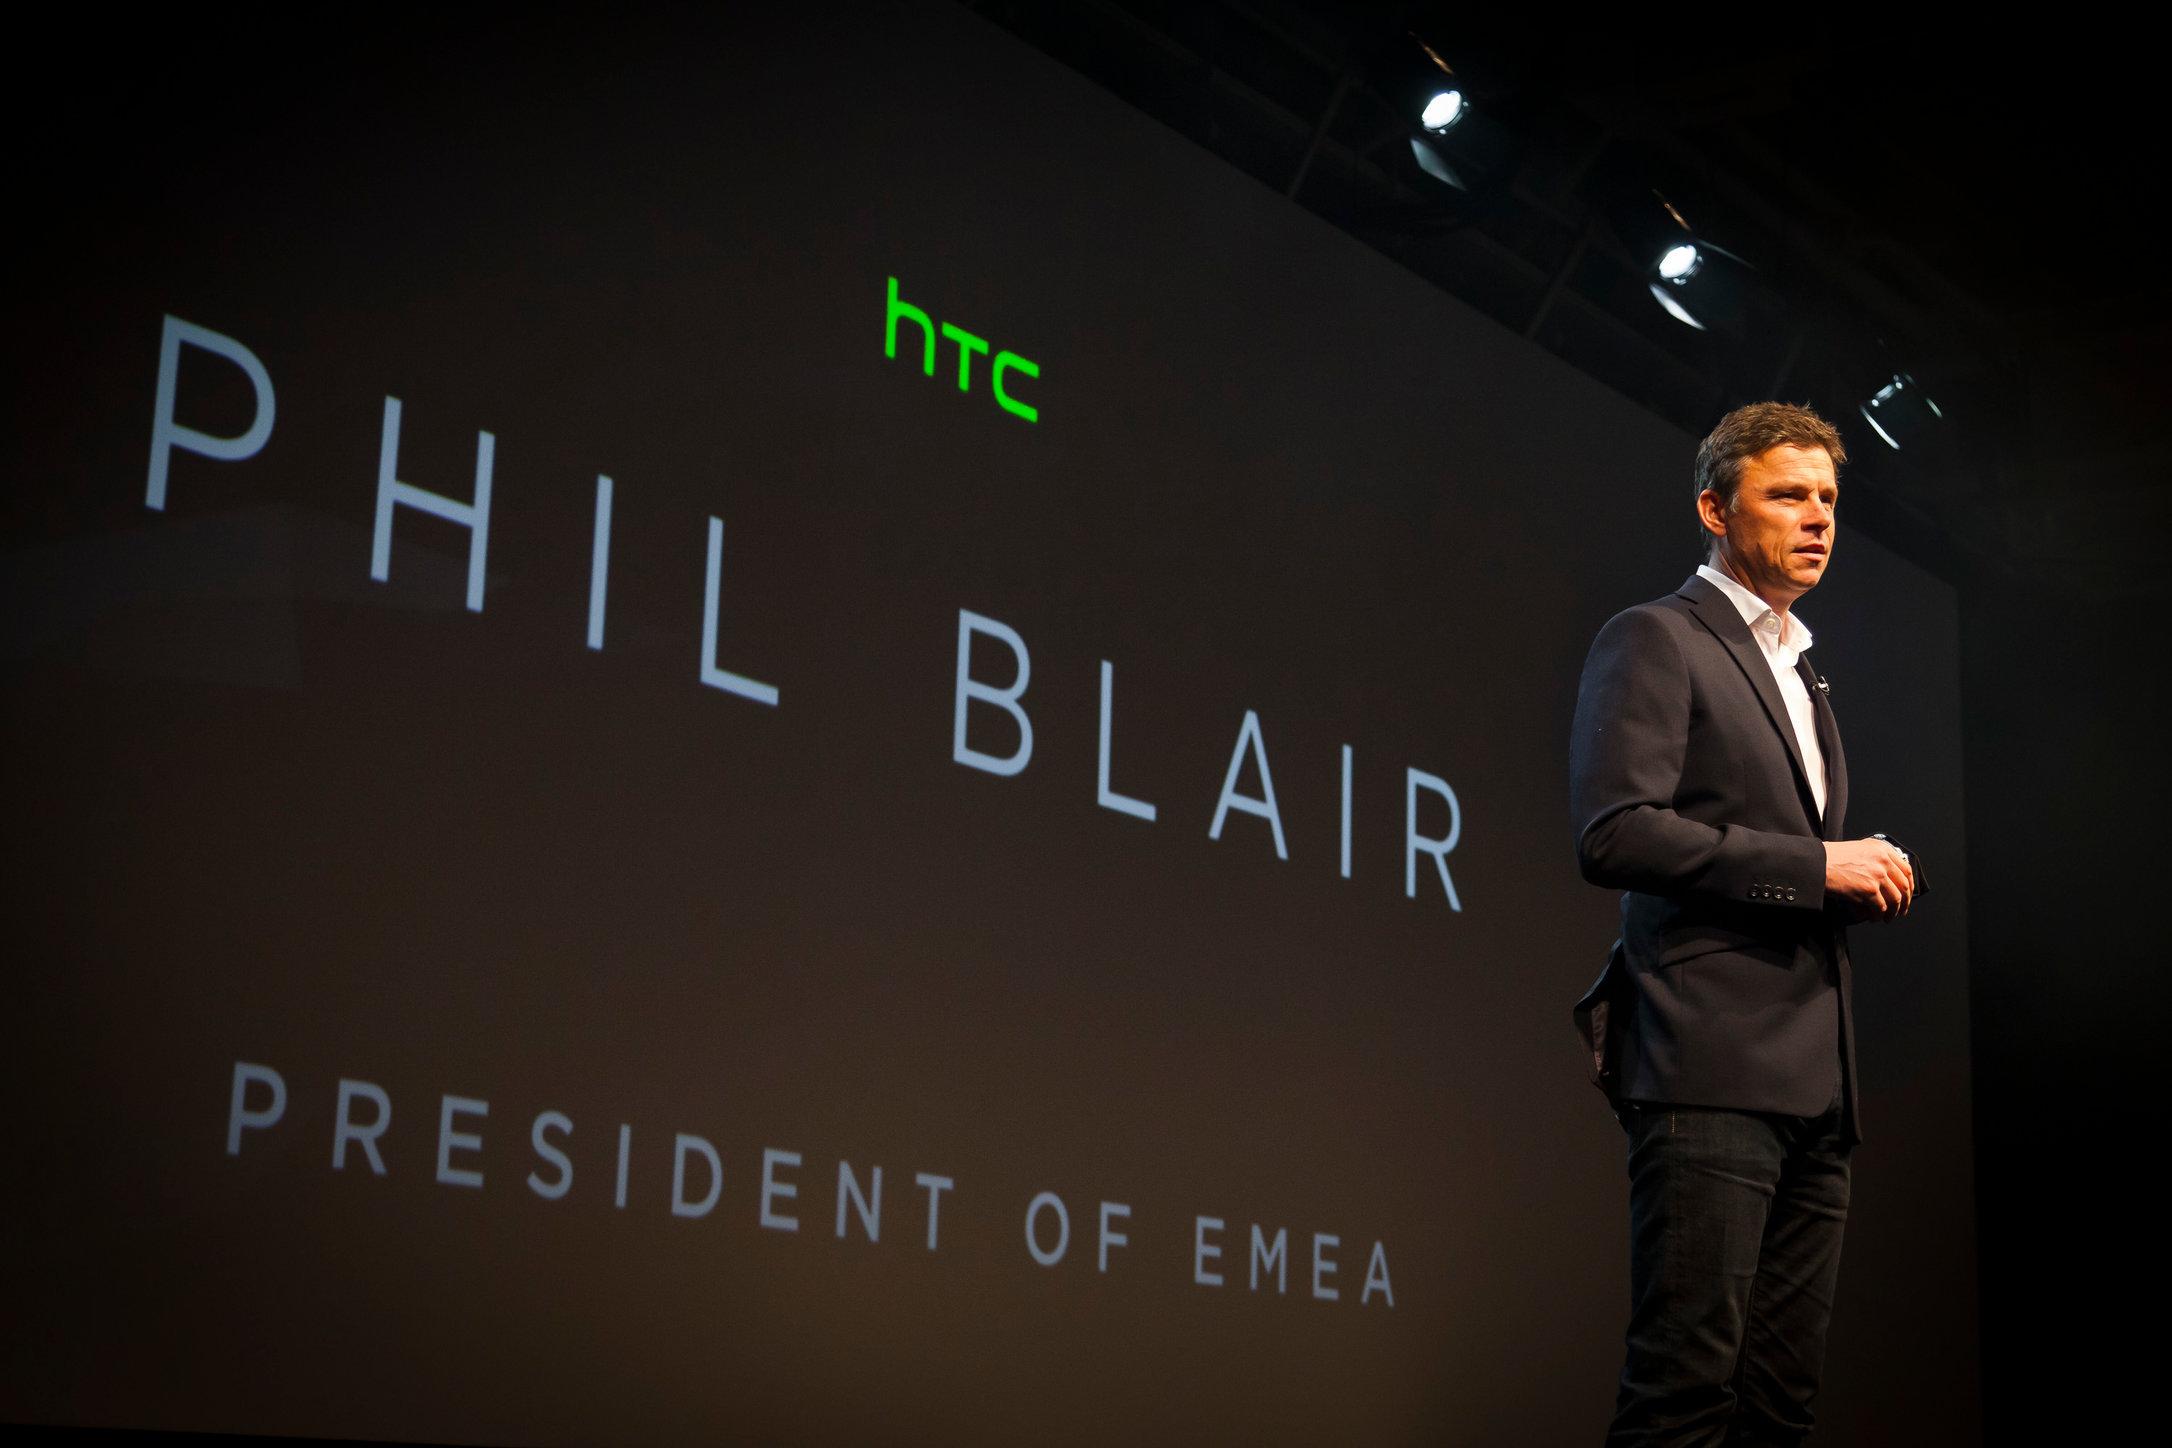 HTC-London-6346-HighRes.jpg